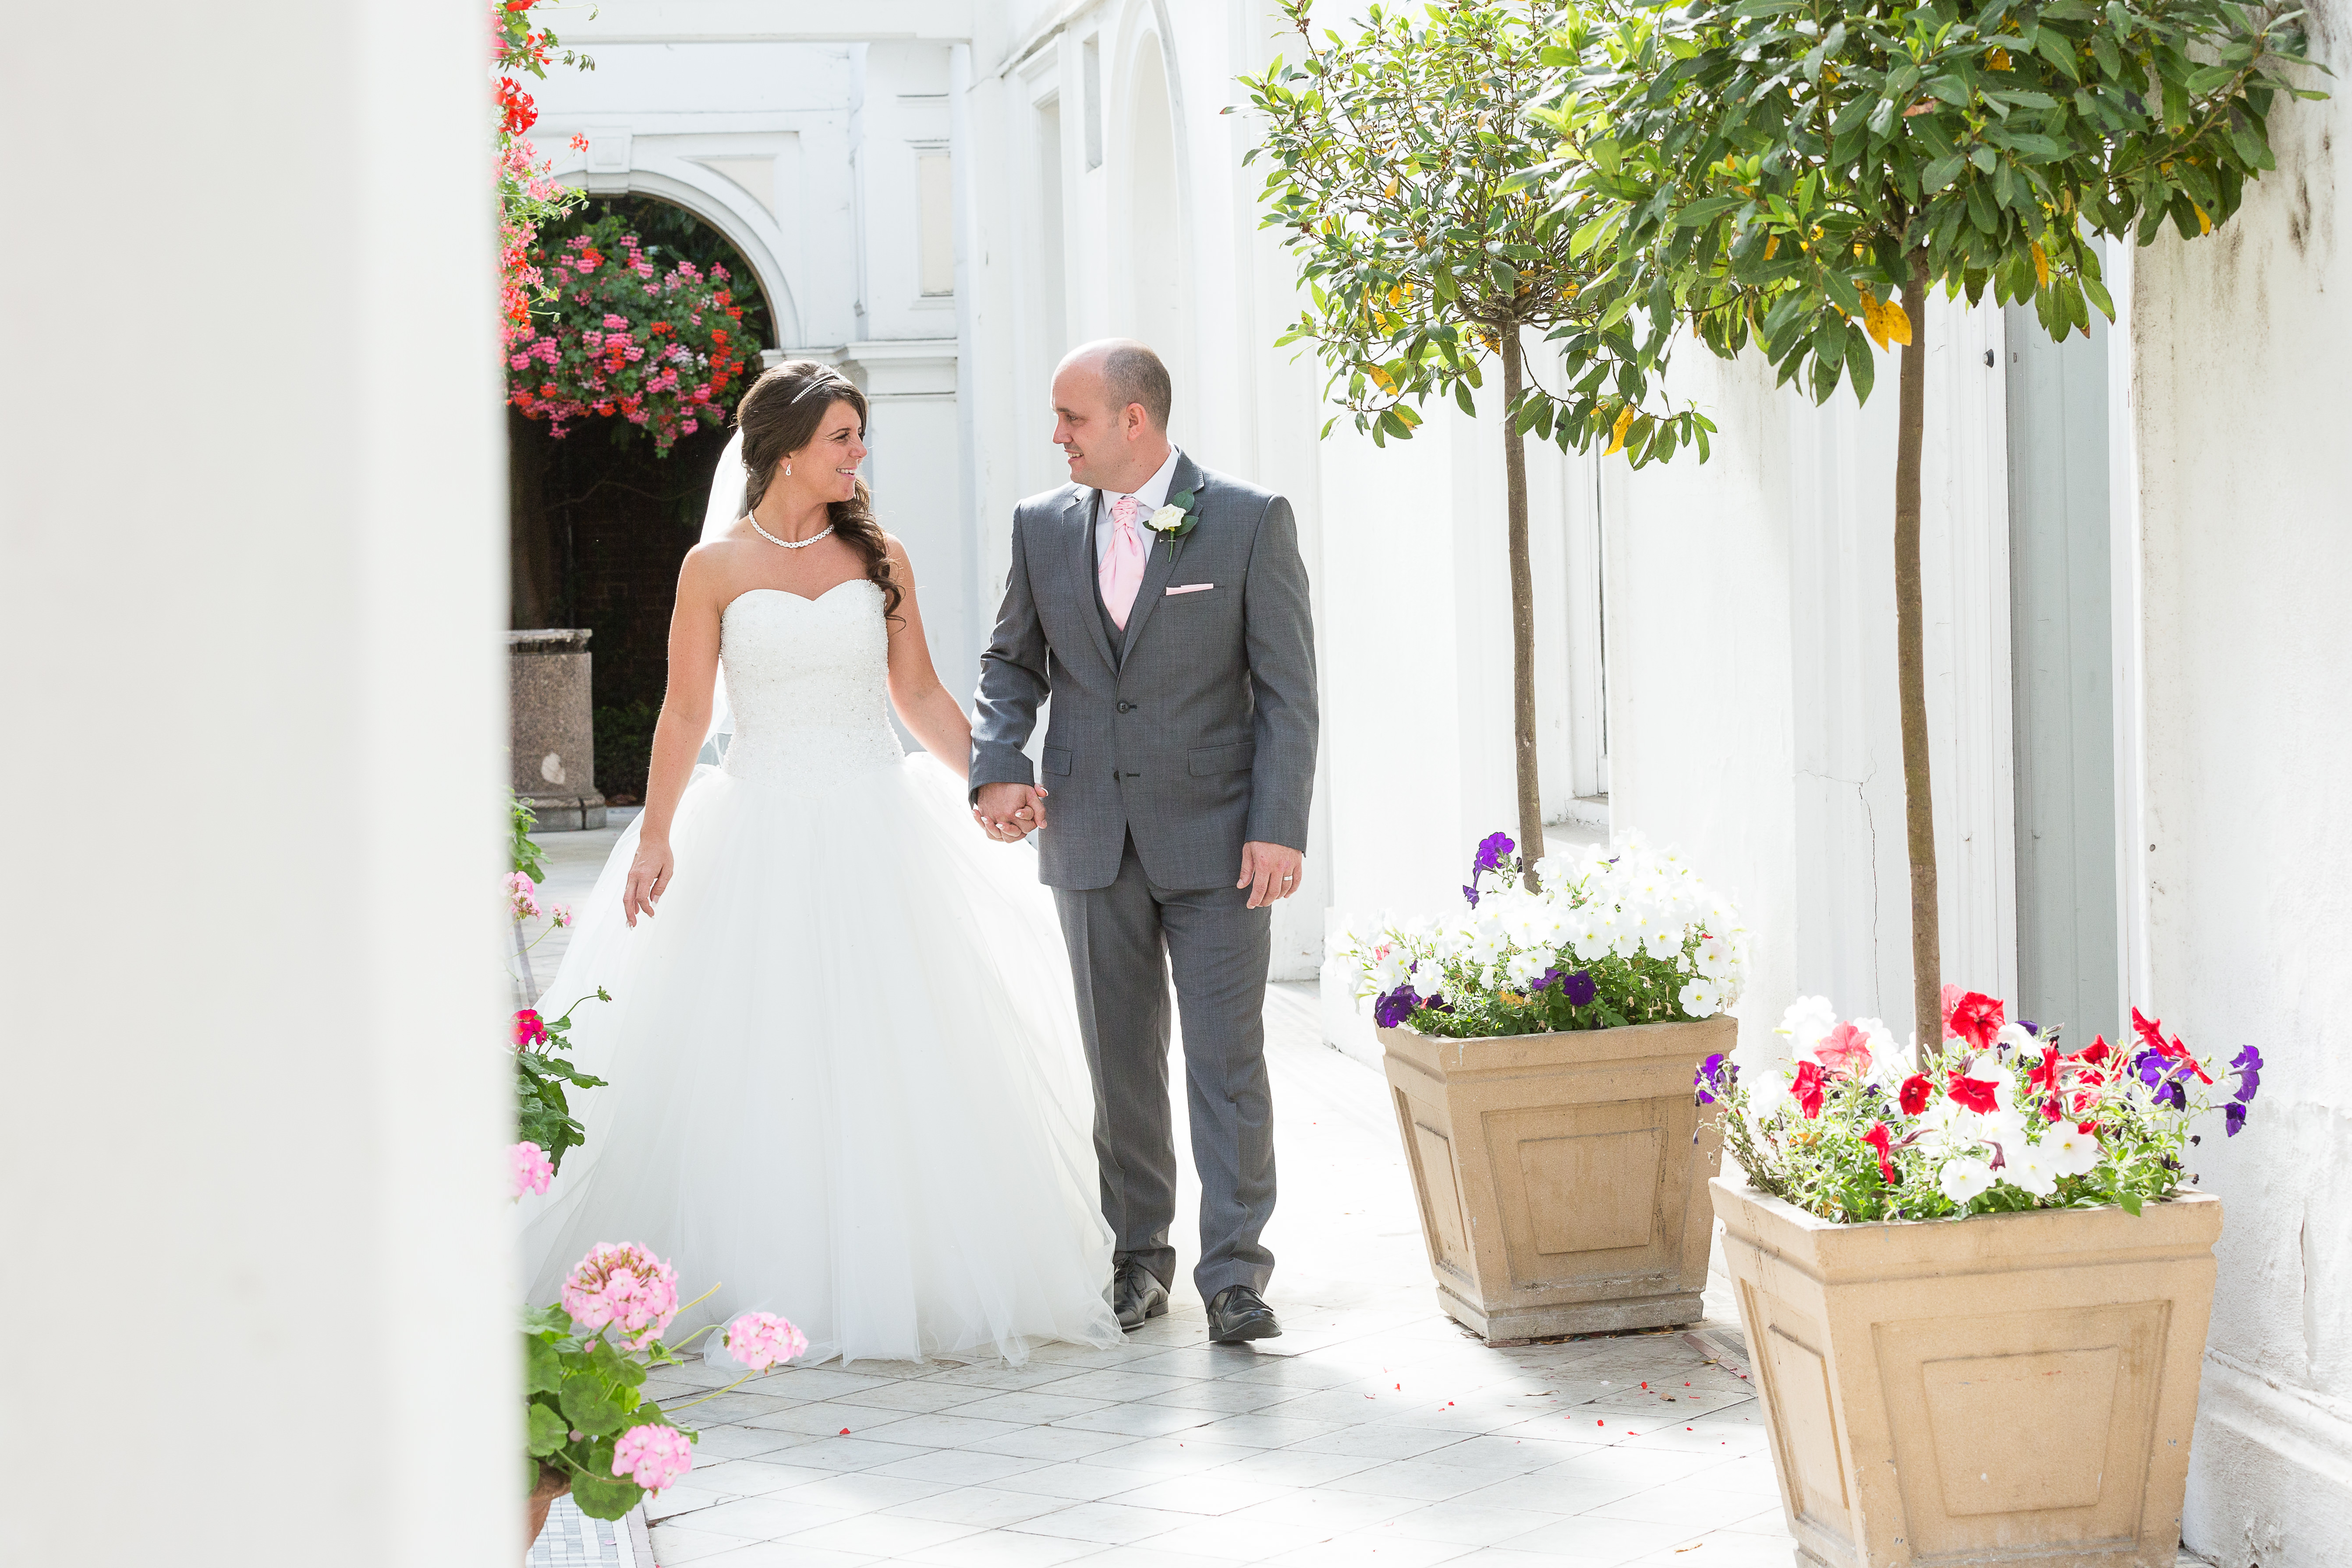 Julia and Ben's wedding at Croydon Rugby Club